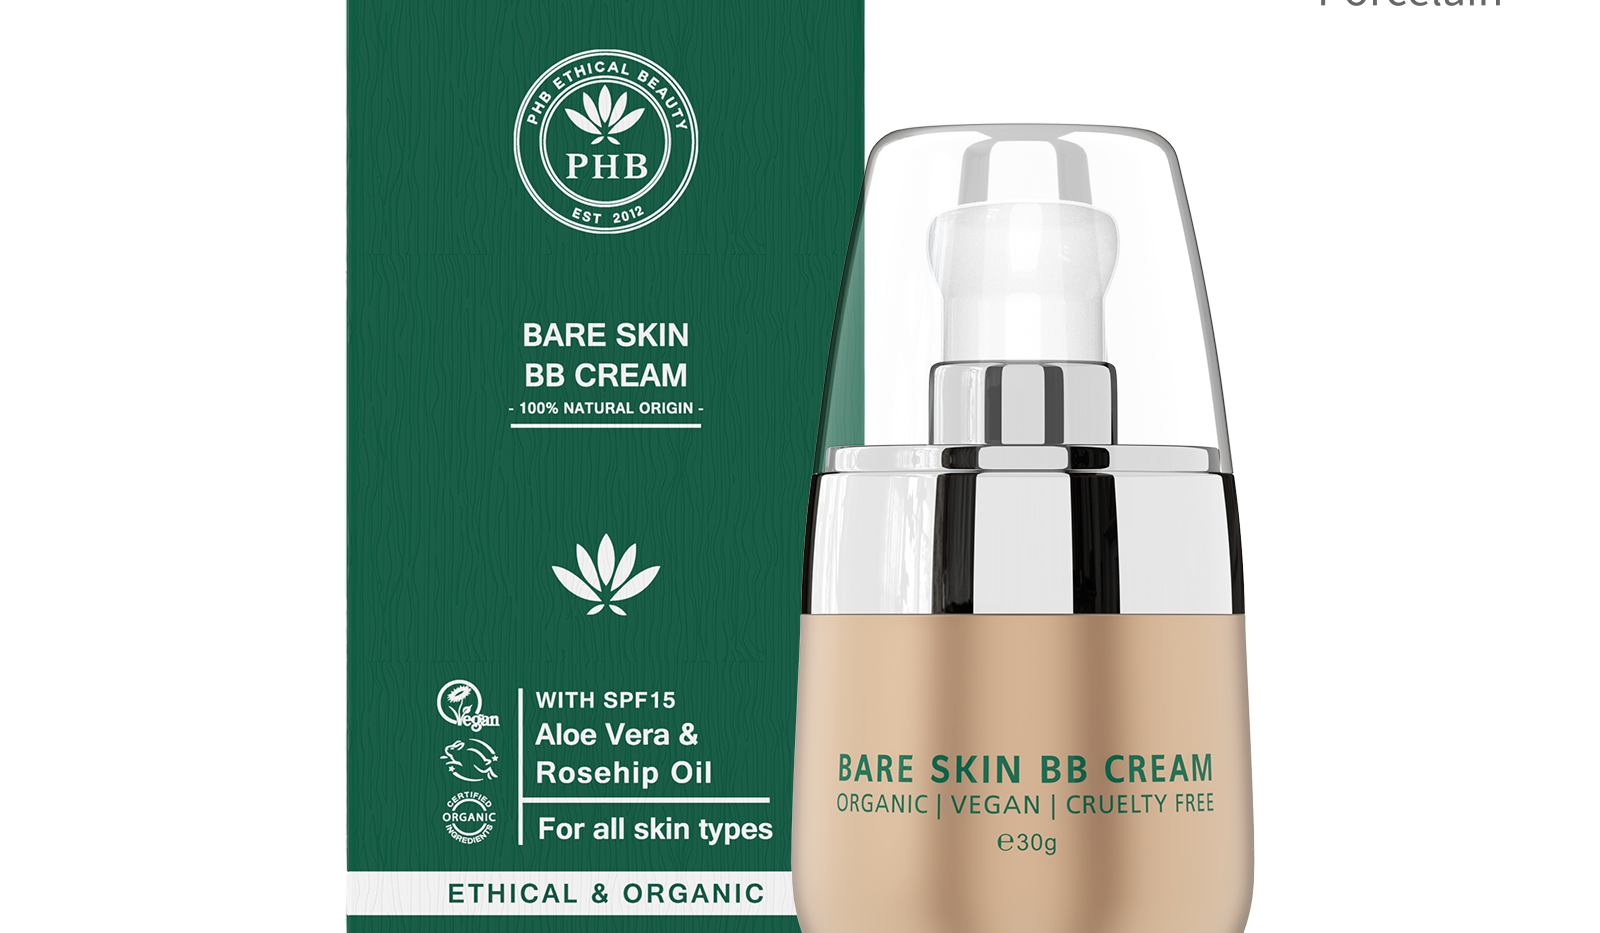 PHB Bare Skin BB Cream - Porcelain.png